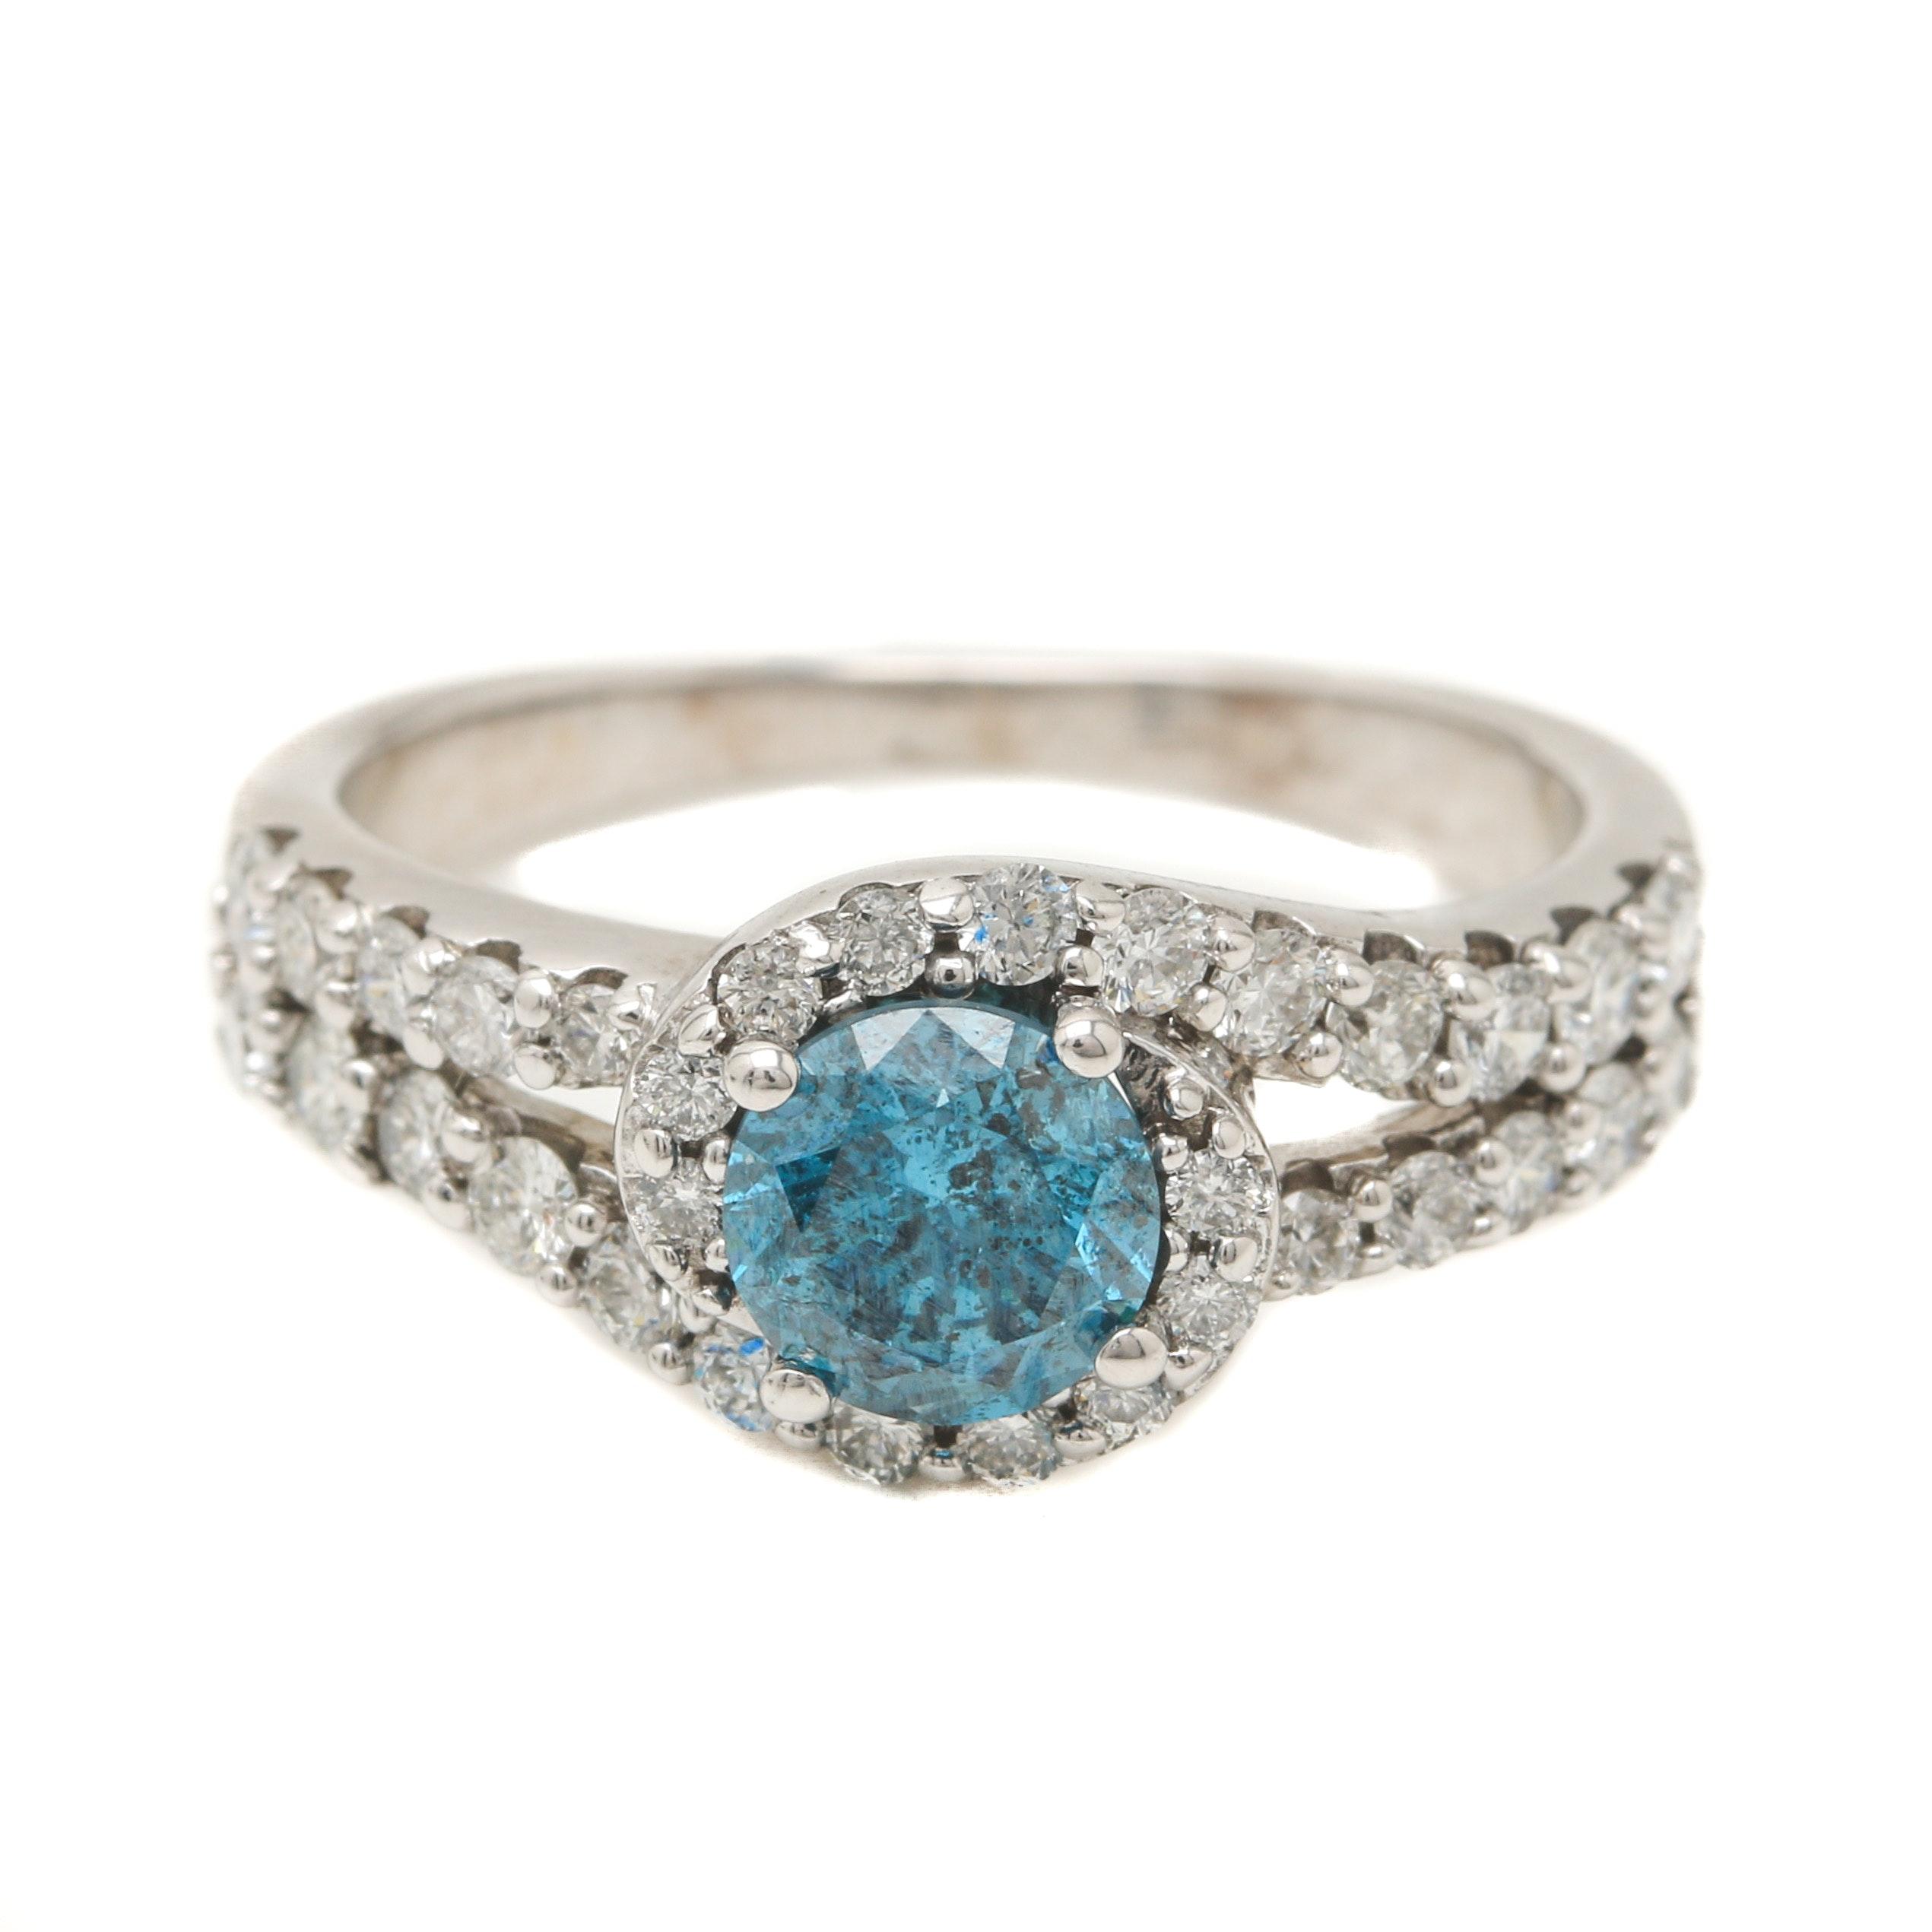 14K White Gold 1.43 CTW Diamond Ring